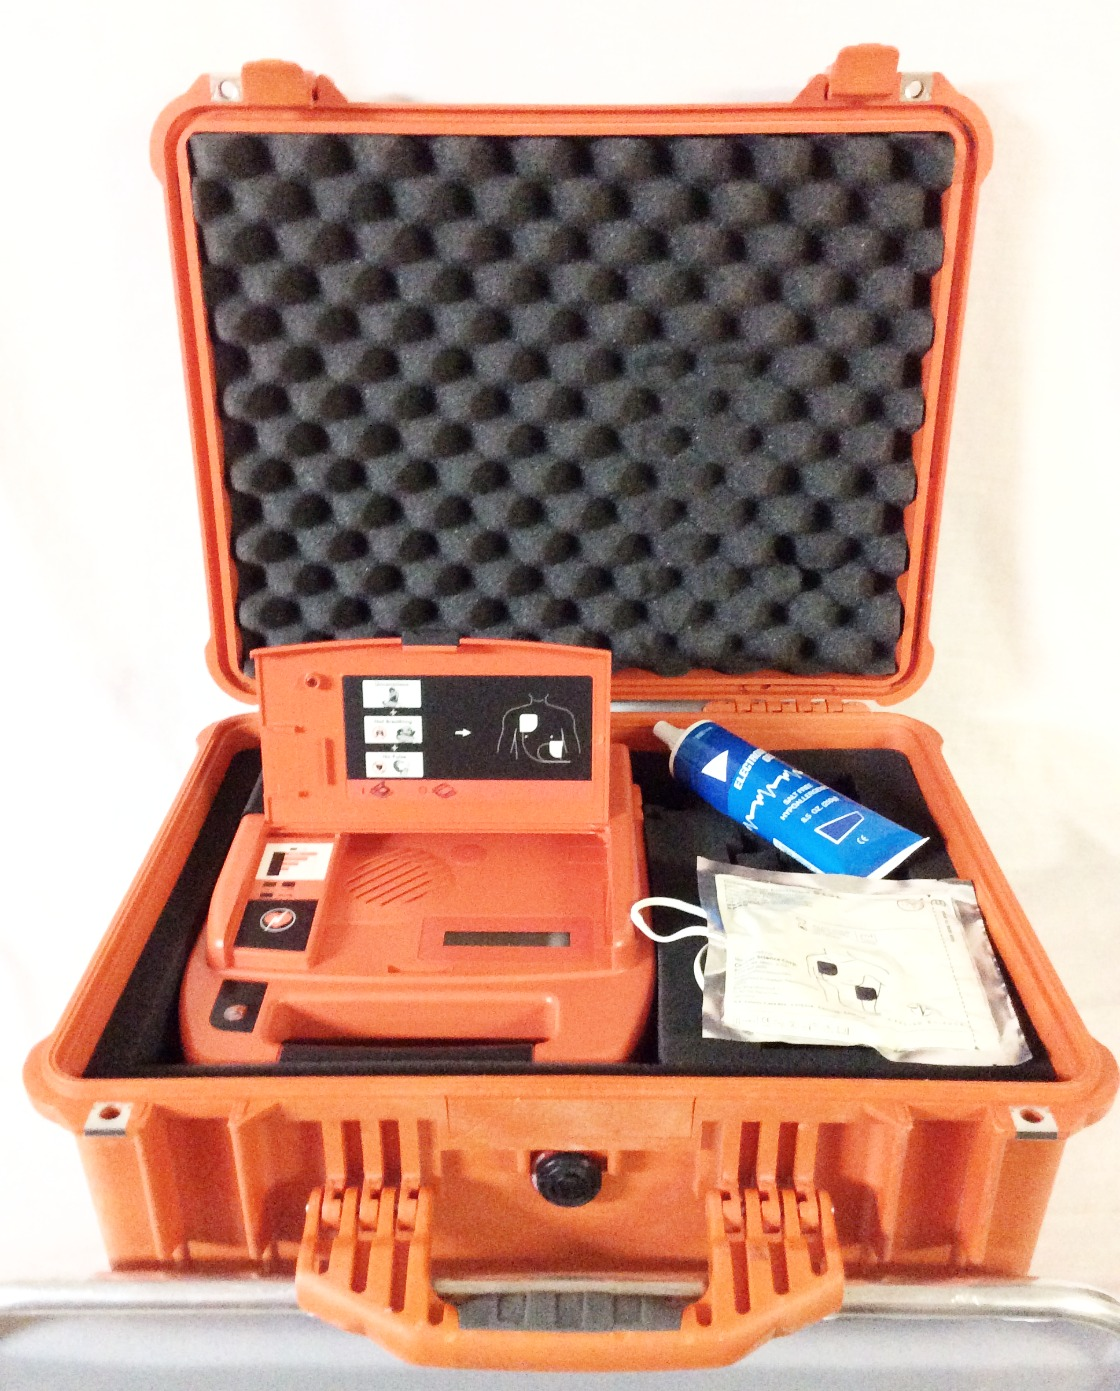 Defibrillator Kit